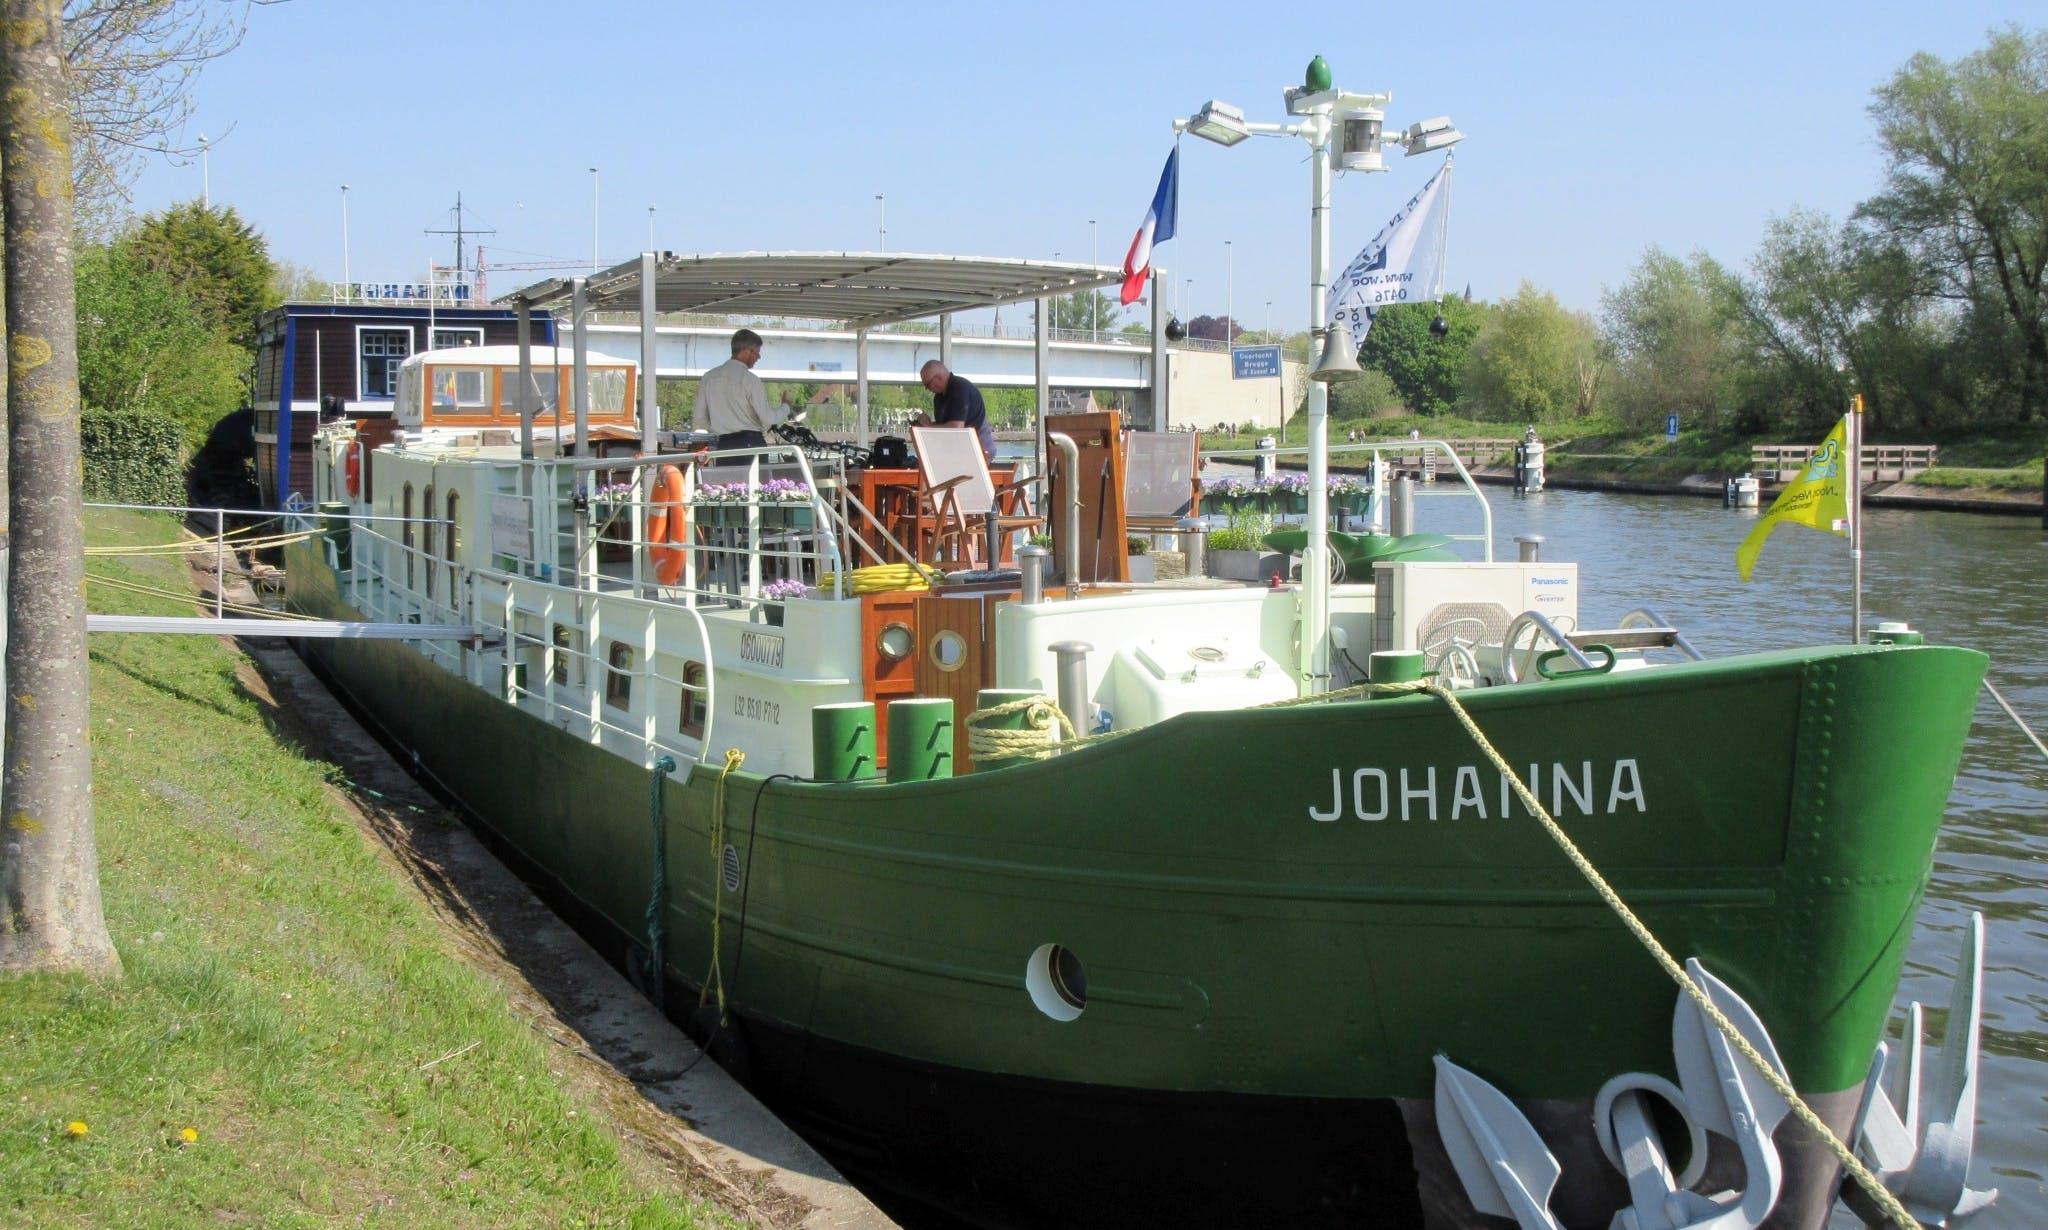 B&B Barge Johanna, Canal Boat in Brugge, Belgium